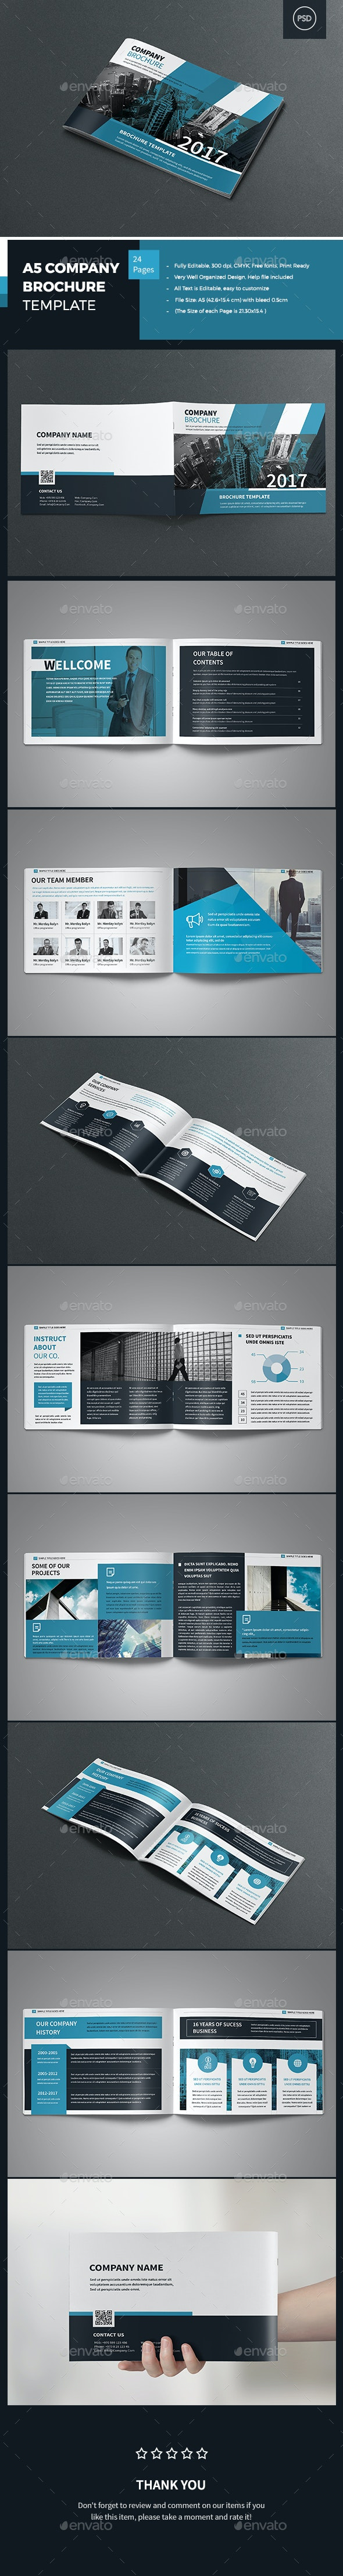 A5 Company Profile Brochure - Corporate Brochures